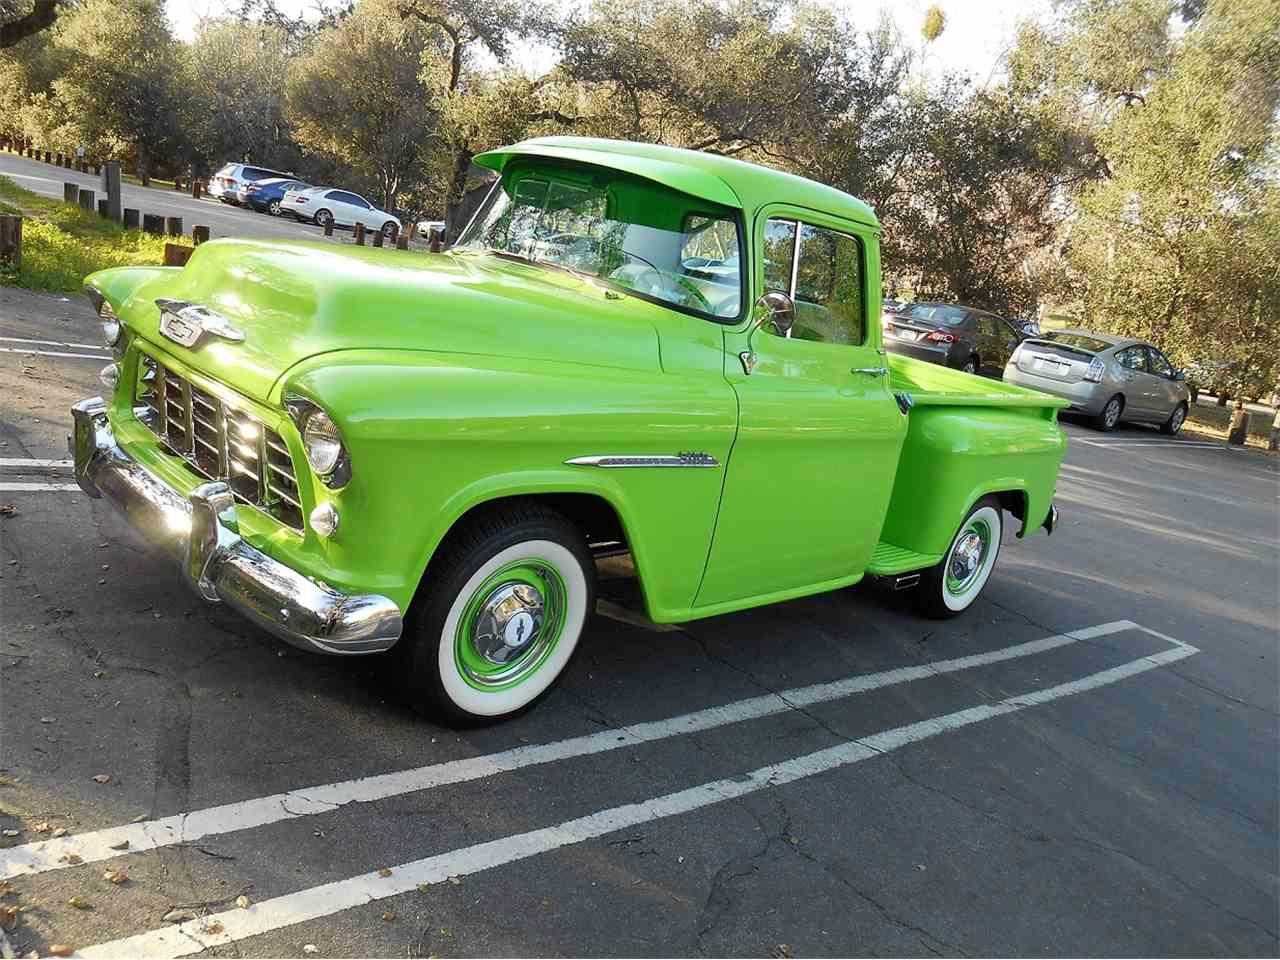 All Chevy 1955 chevrolet 3100 : 1955 Chevrolet 3100 for Sale | ClassicCars.com | CC-814581